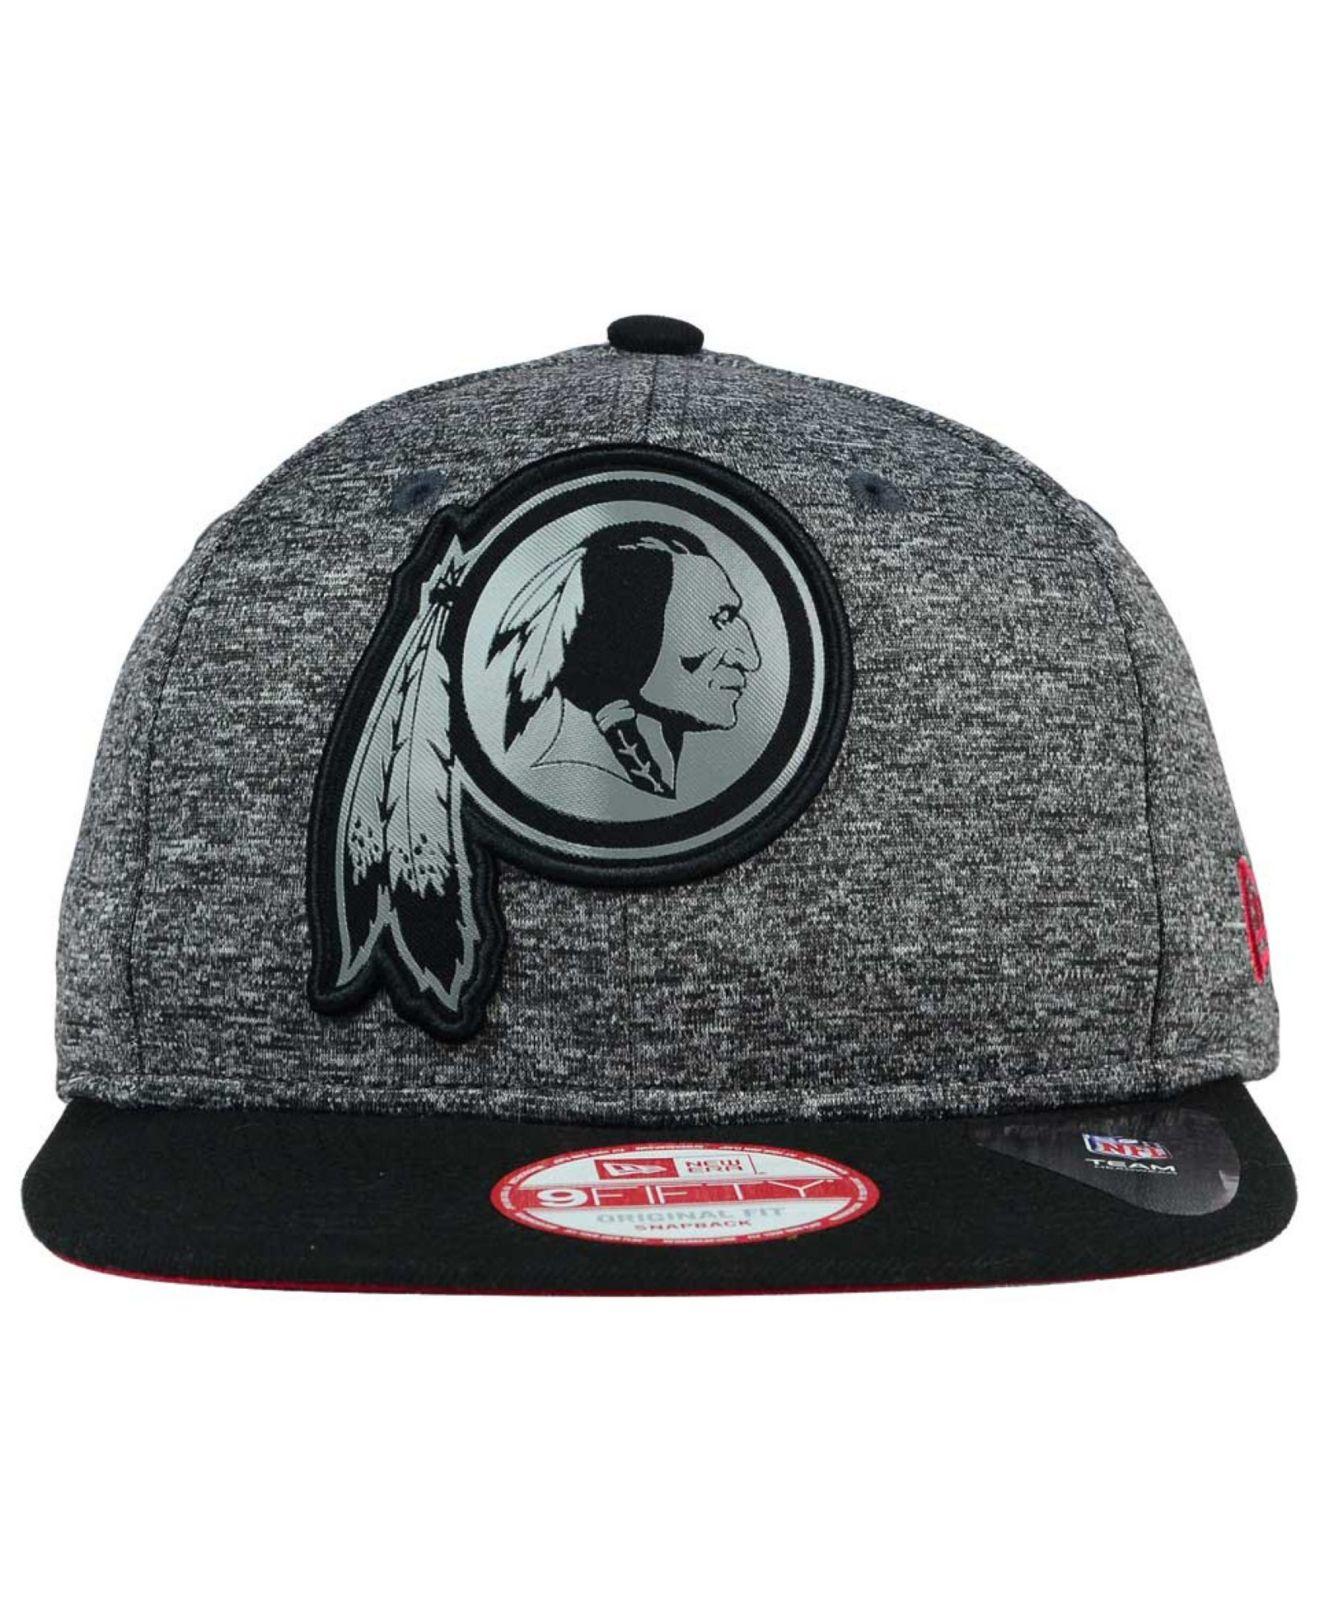 a1cfc6a38c6 Lyst - KTZ Washington Redskins Gridiron 9fifty Snapback Cap in Black ...